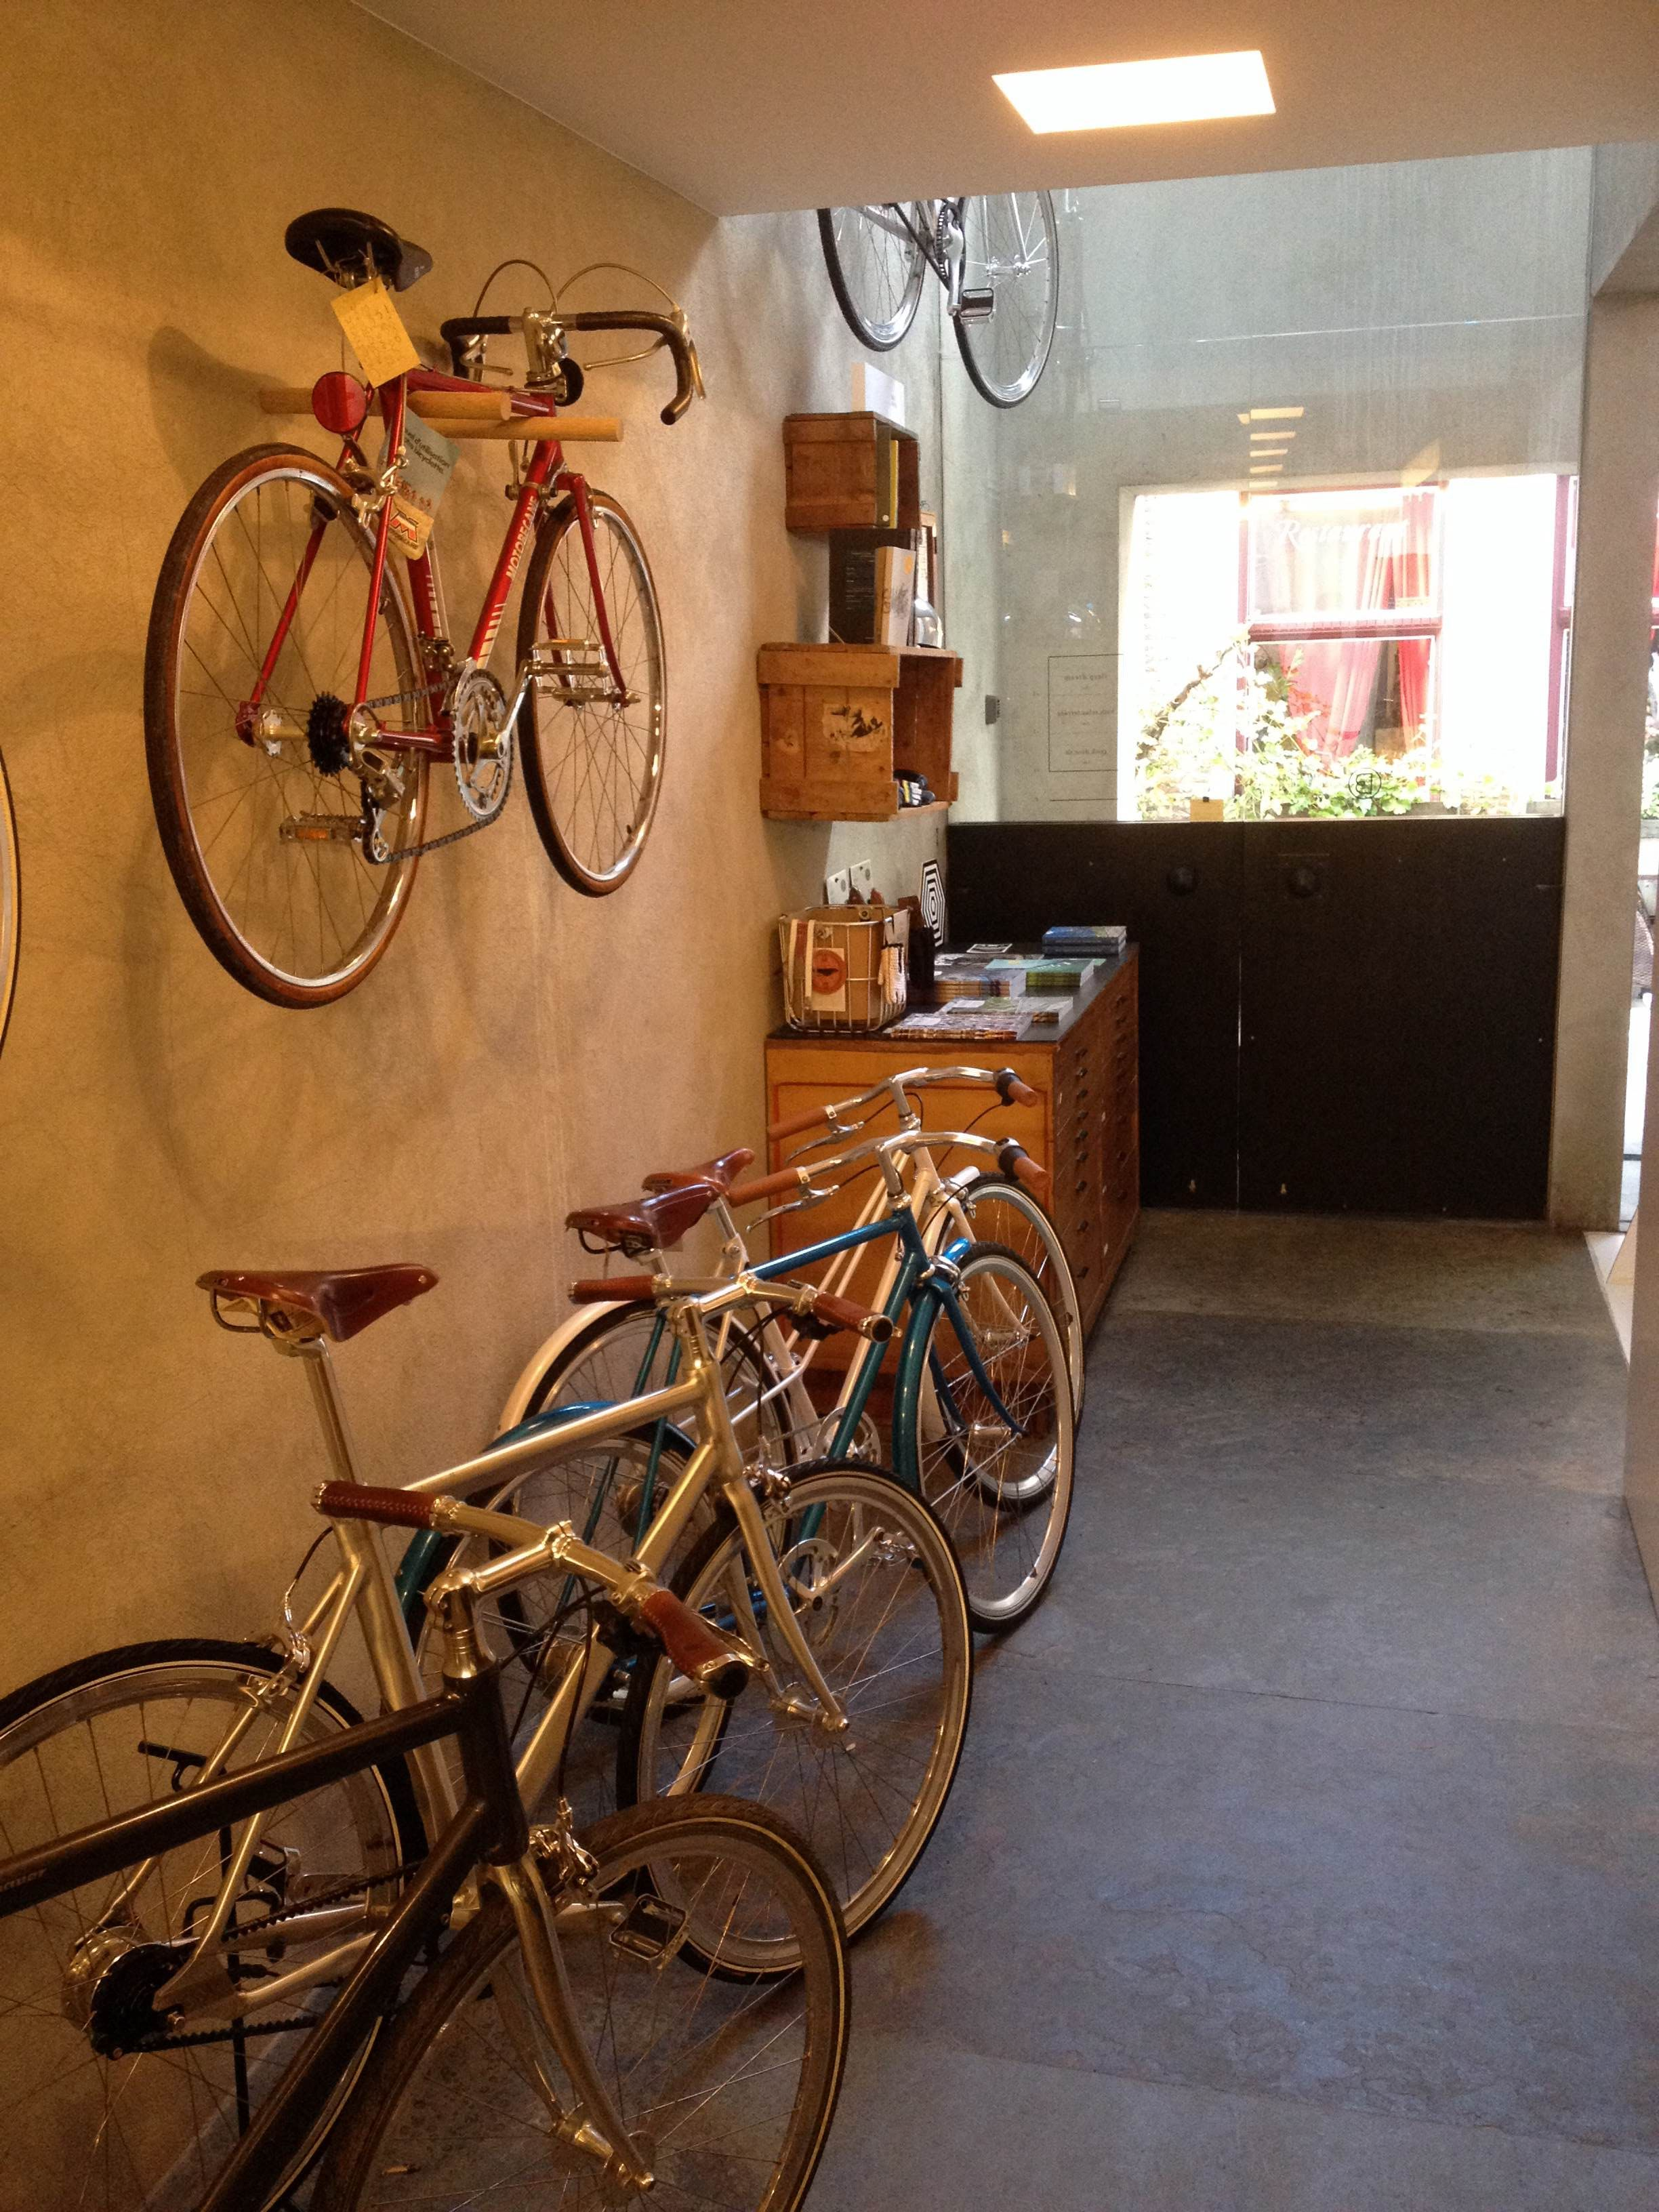 b2cc3e2ce0e Blanco Bike Luxury - Gent Bike Shops, Bicycle Shop, Cycling, Veils, Cycle